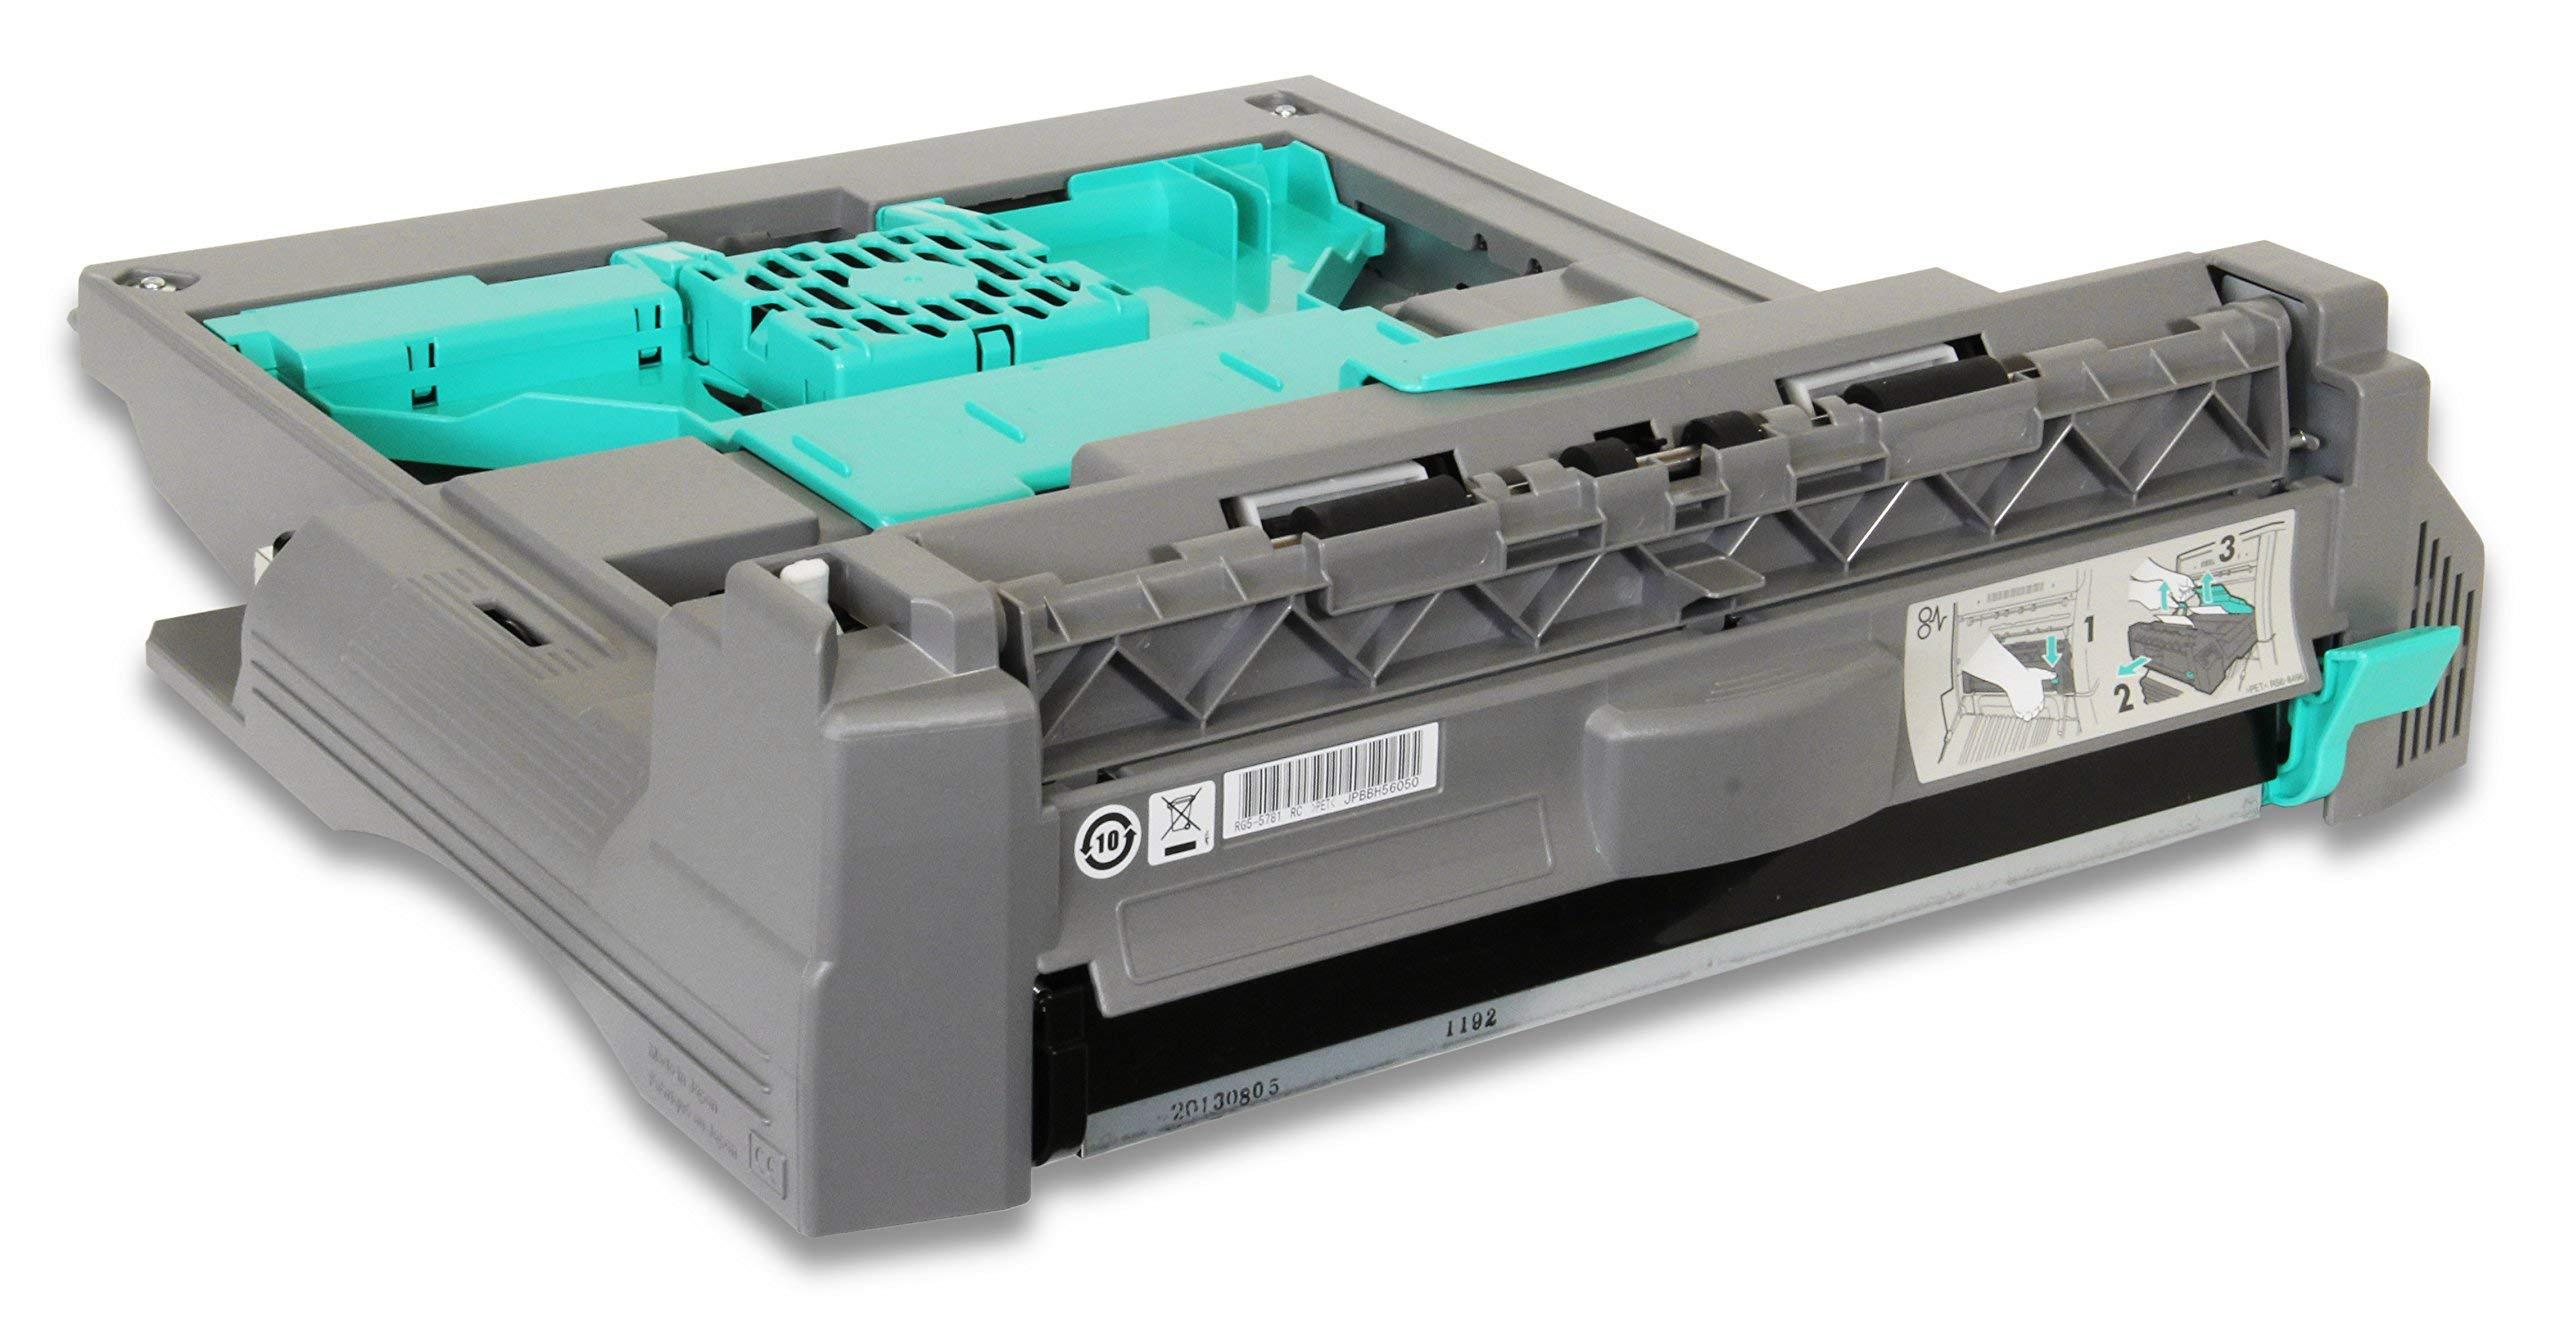 HP LaserJet 9000 9050 Duplexer/Duplex Accessory - C8532A (Renewed)